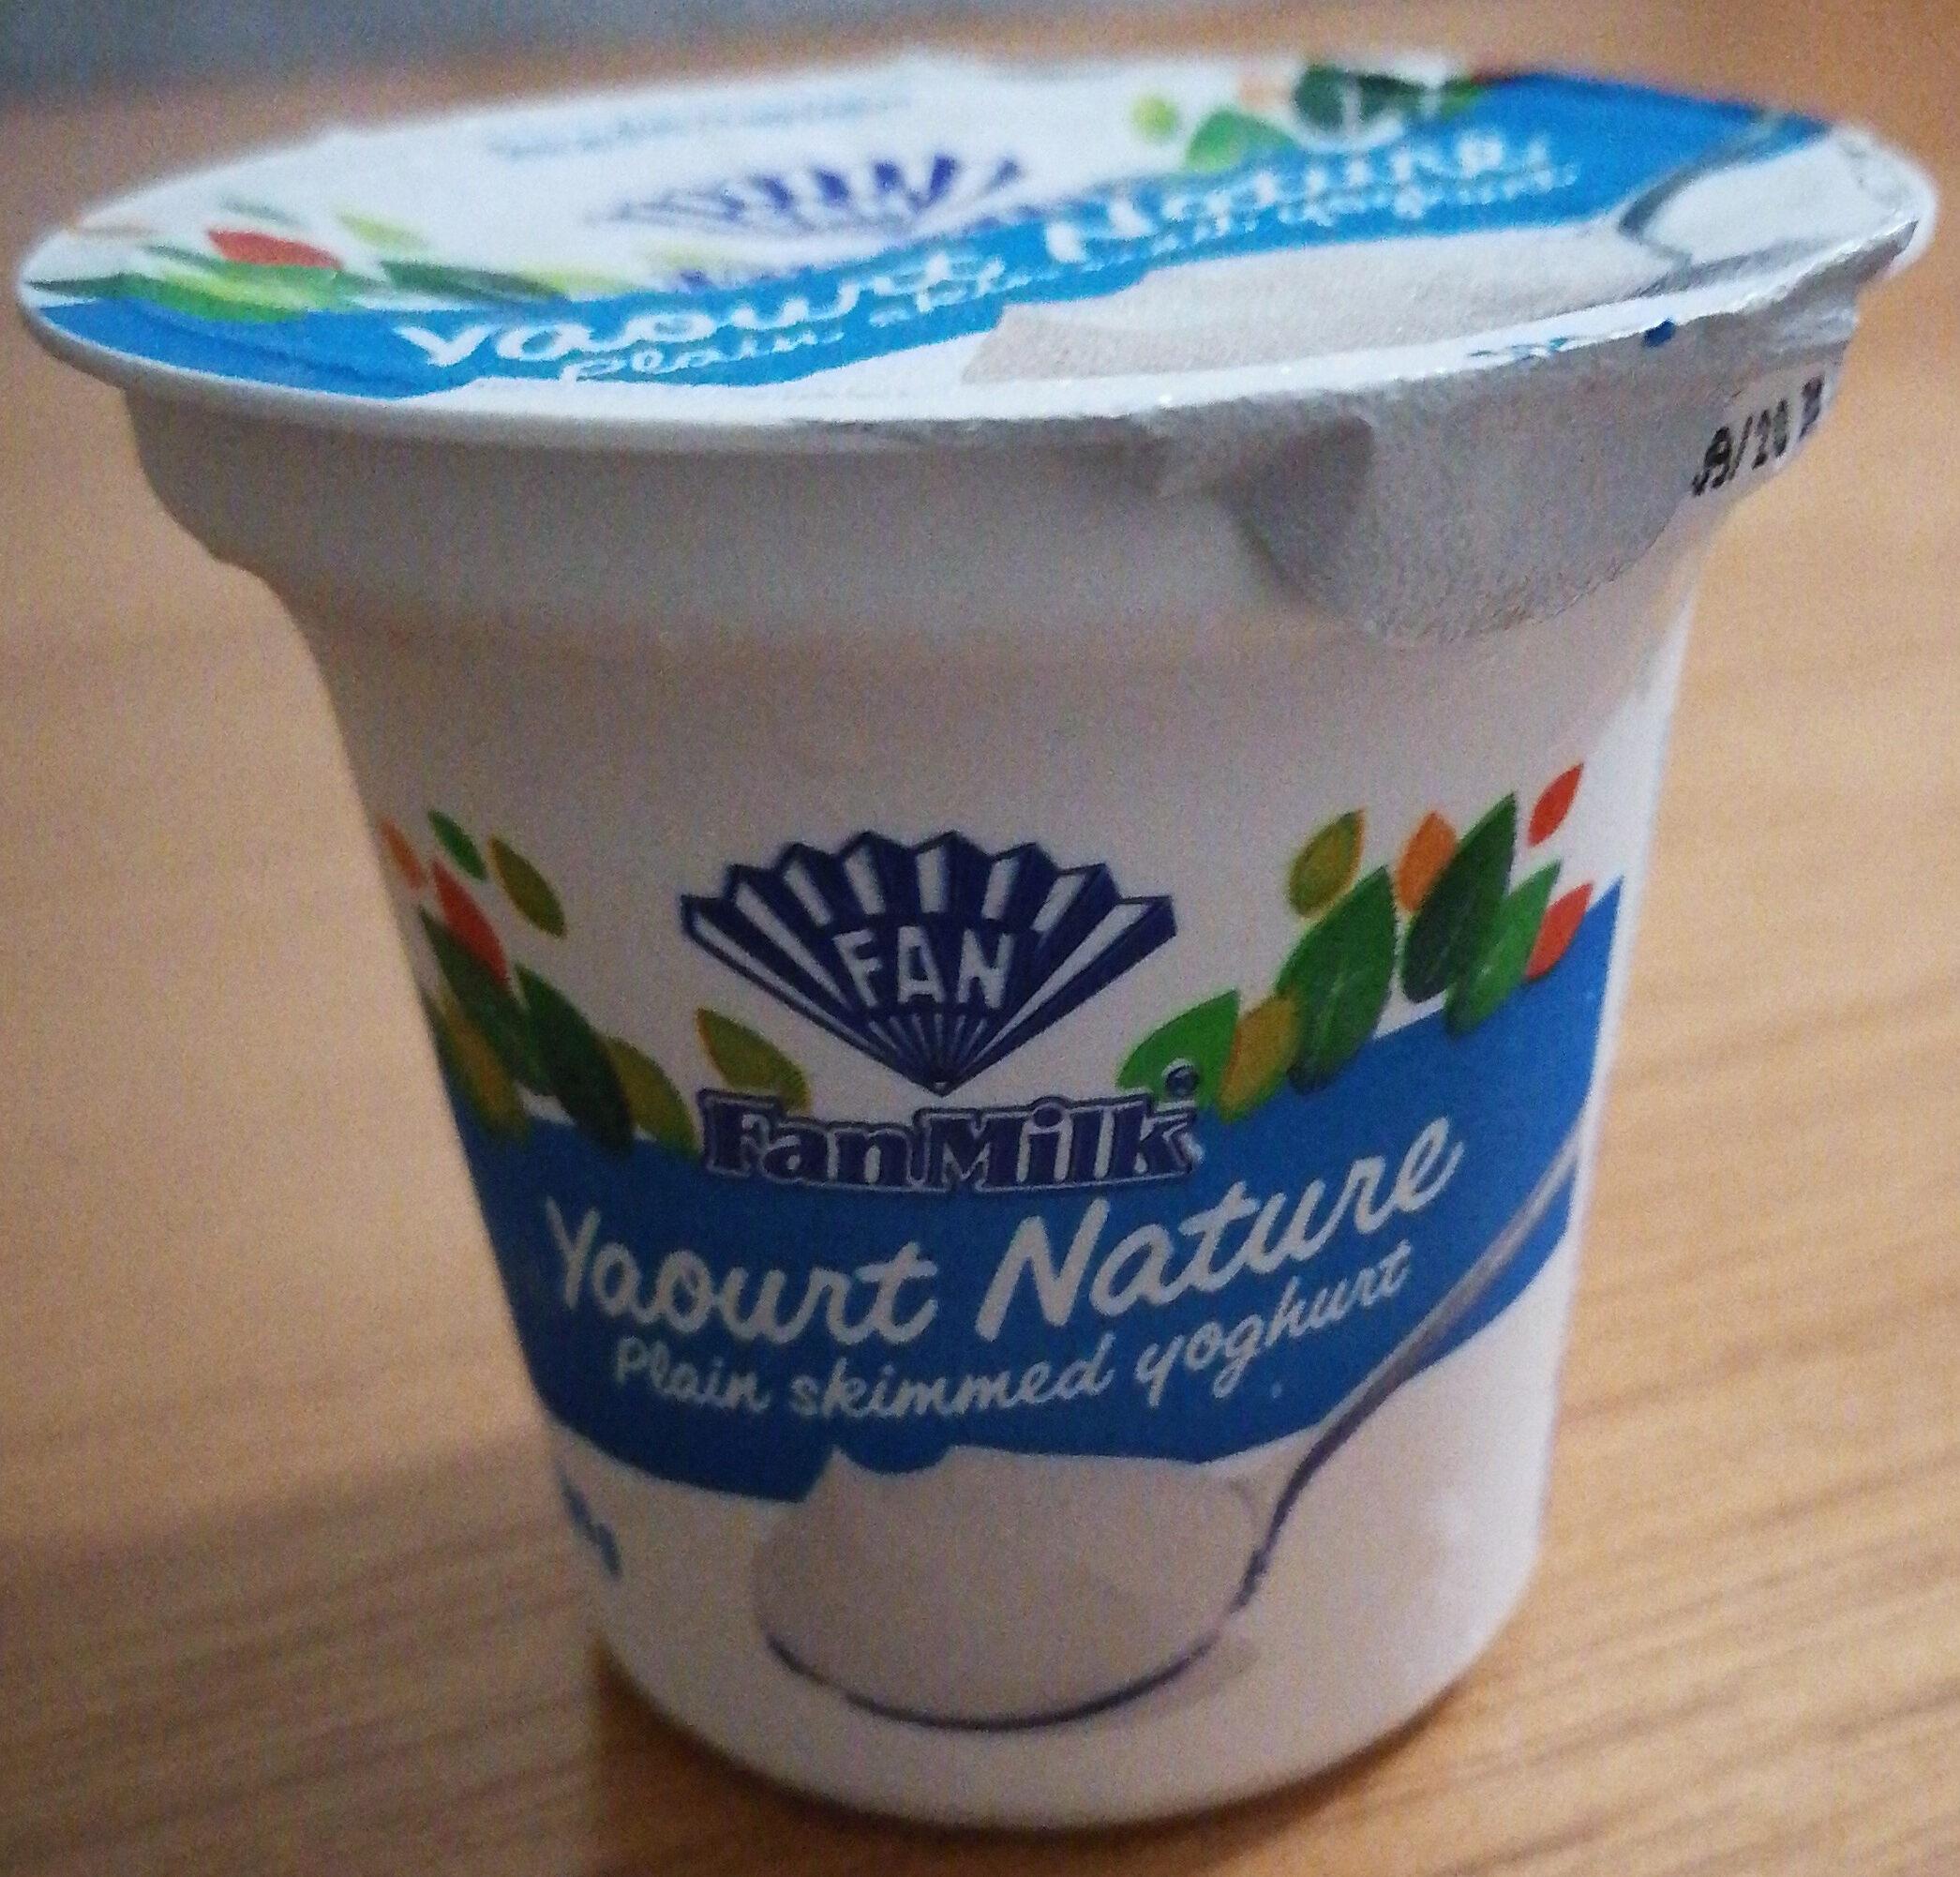 yaourt nature - Product - en